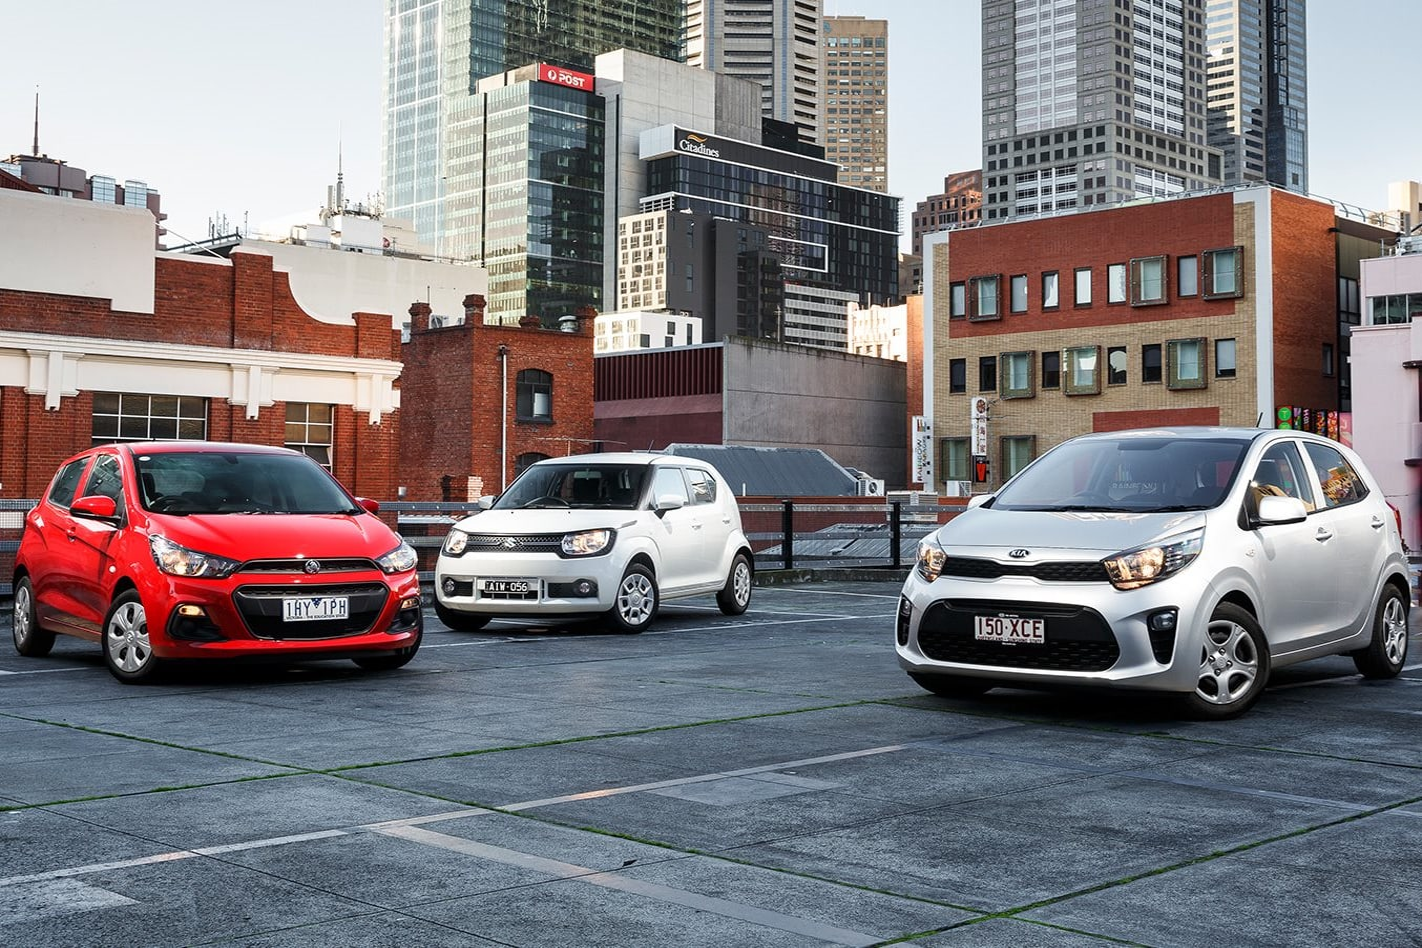 Holden Spark v Suzuki Ignis v Kia Picanto - Minority Retort